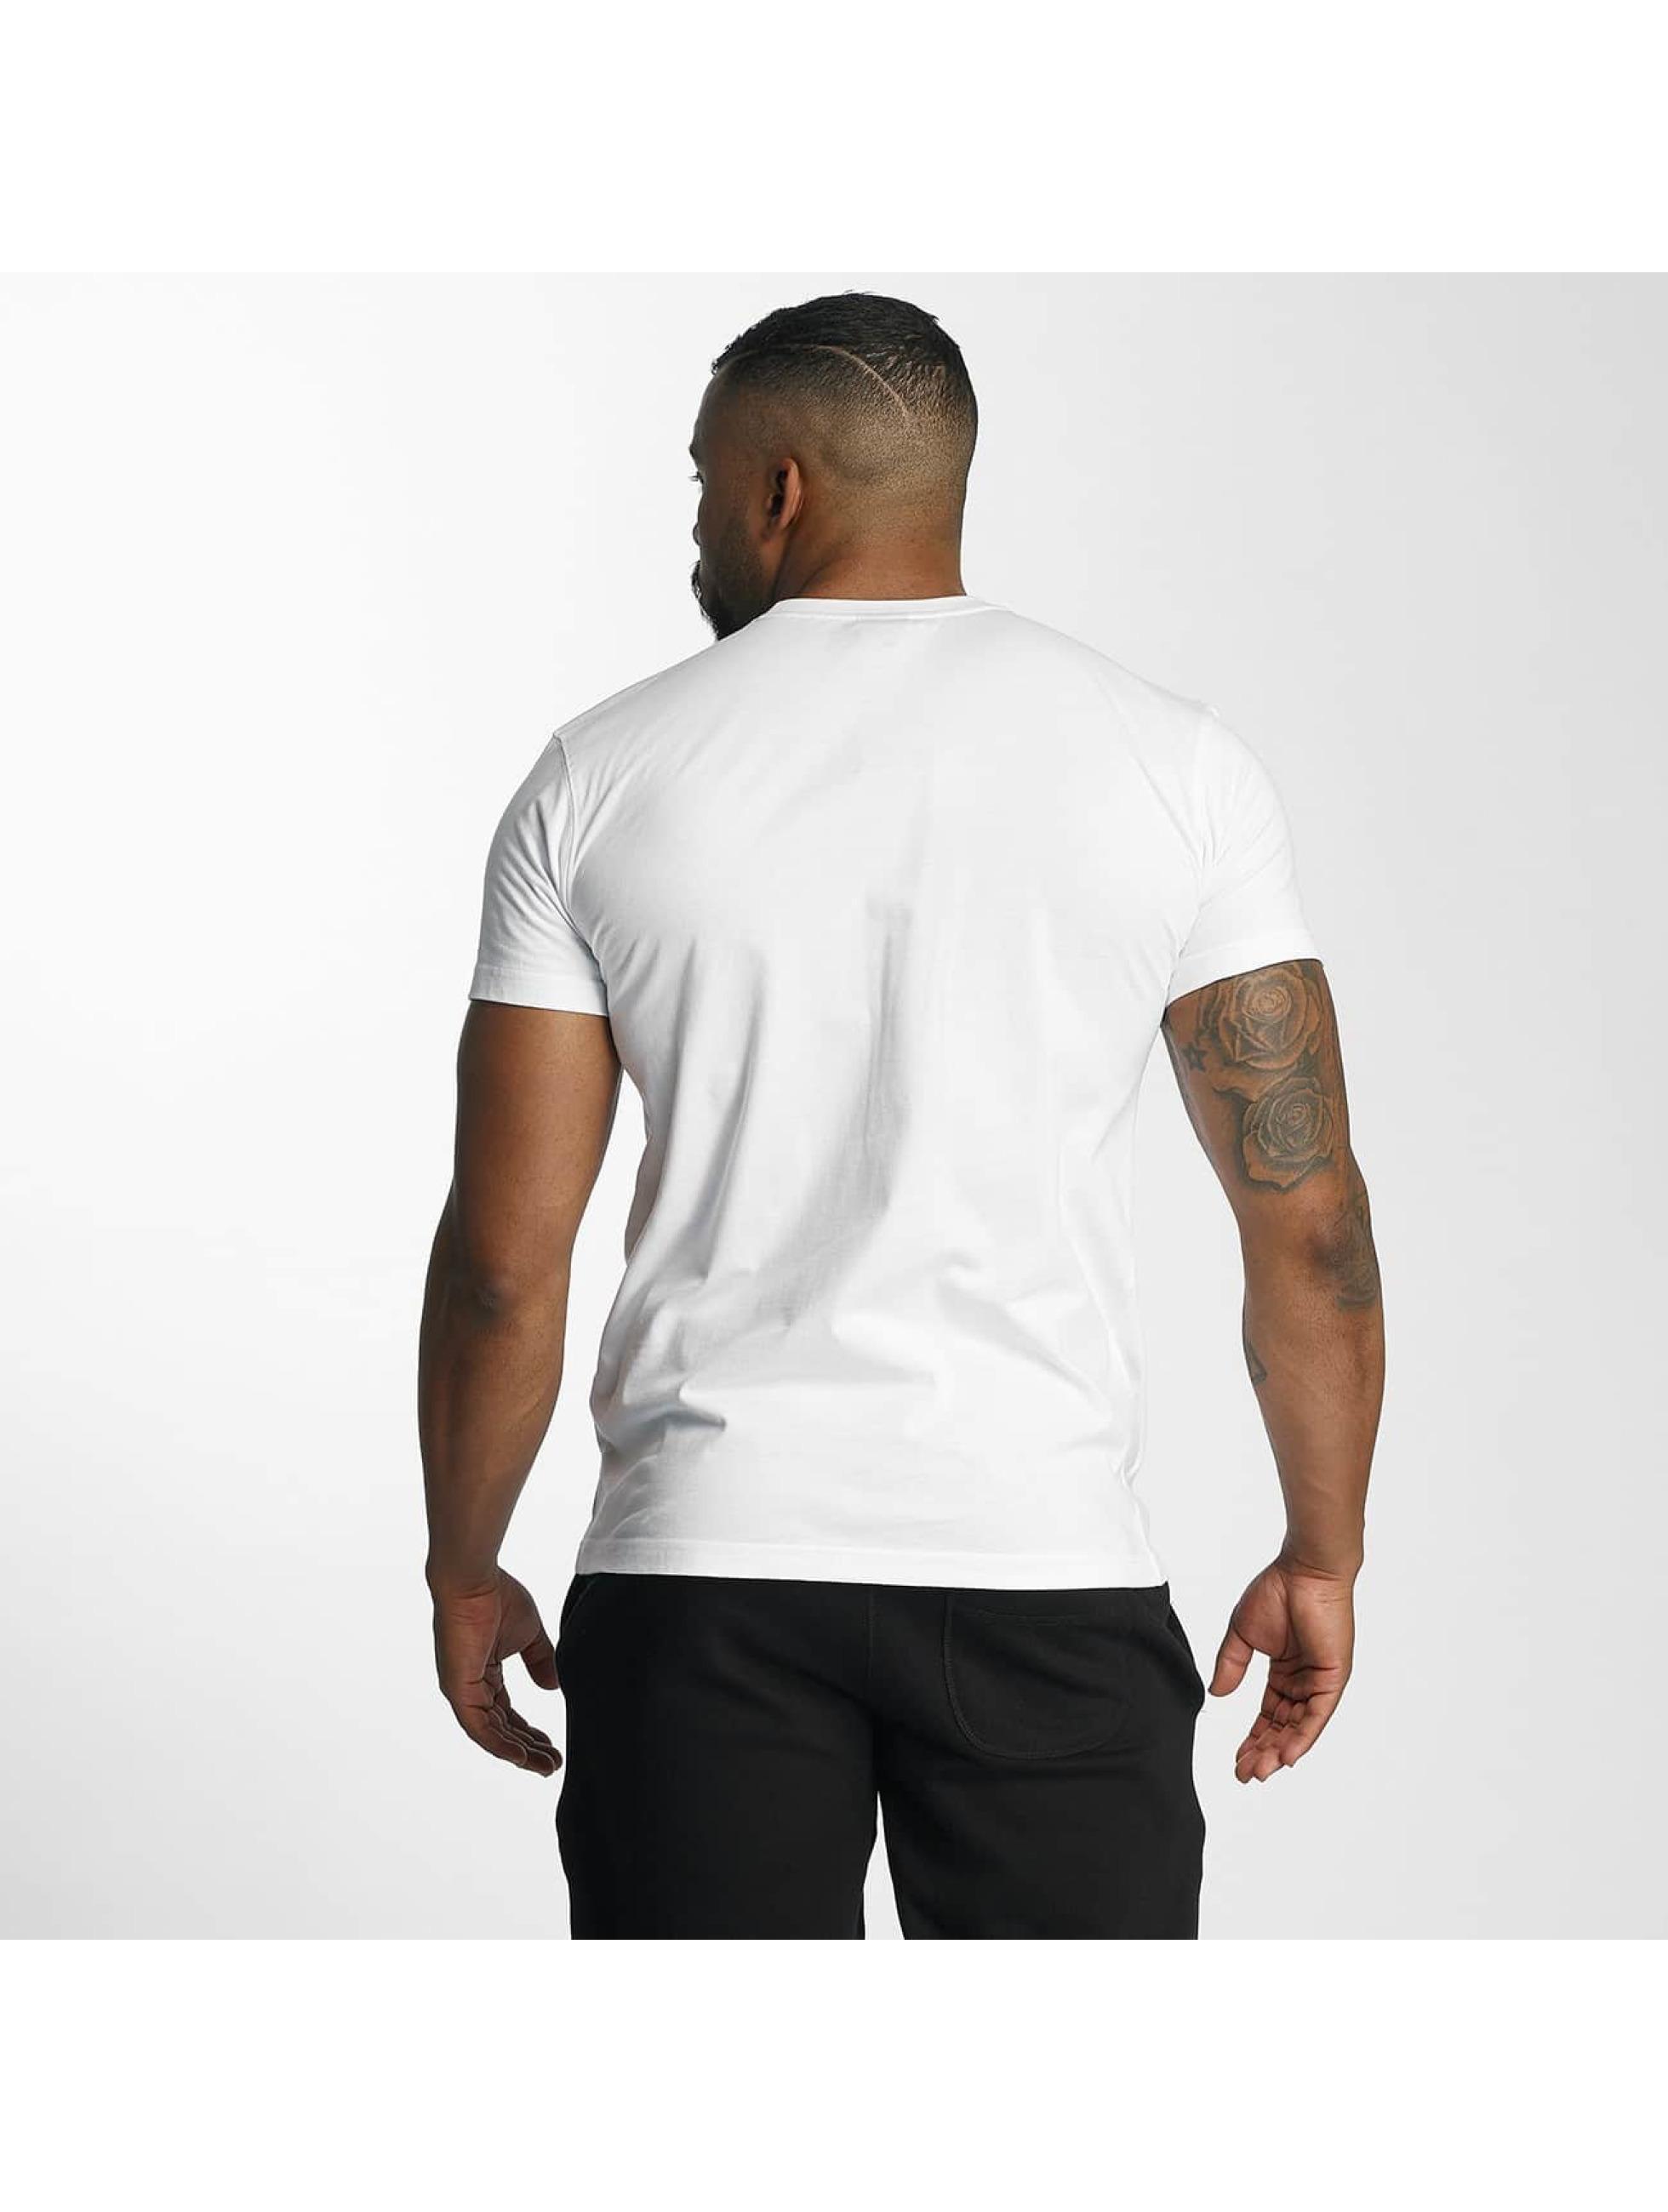 Pusher Apparel T-paidat White Carrera valkoinen